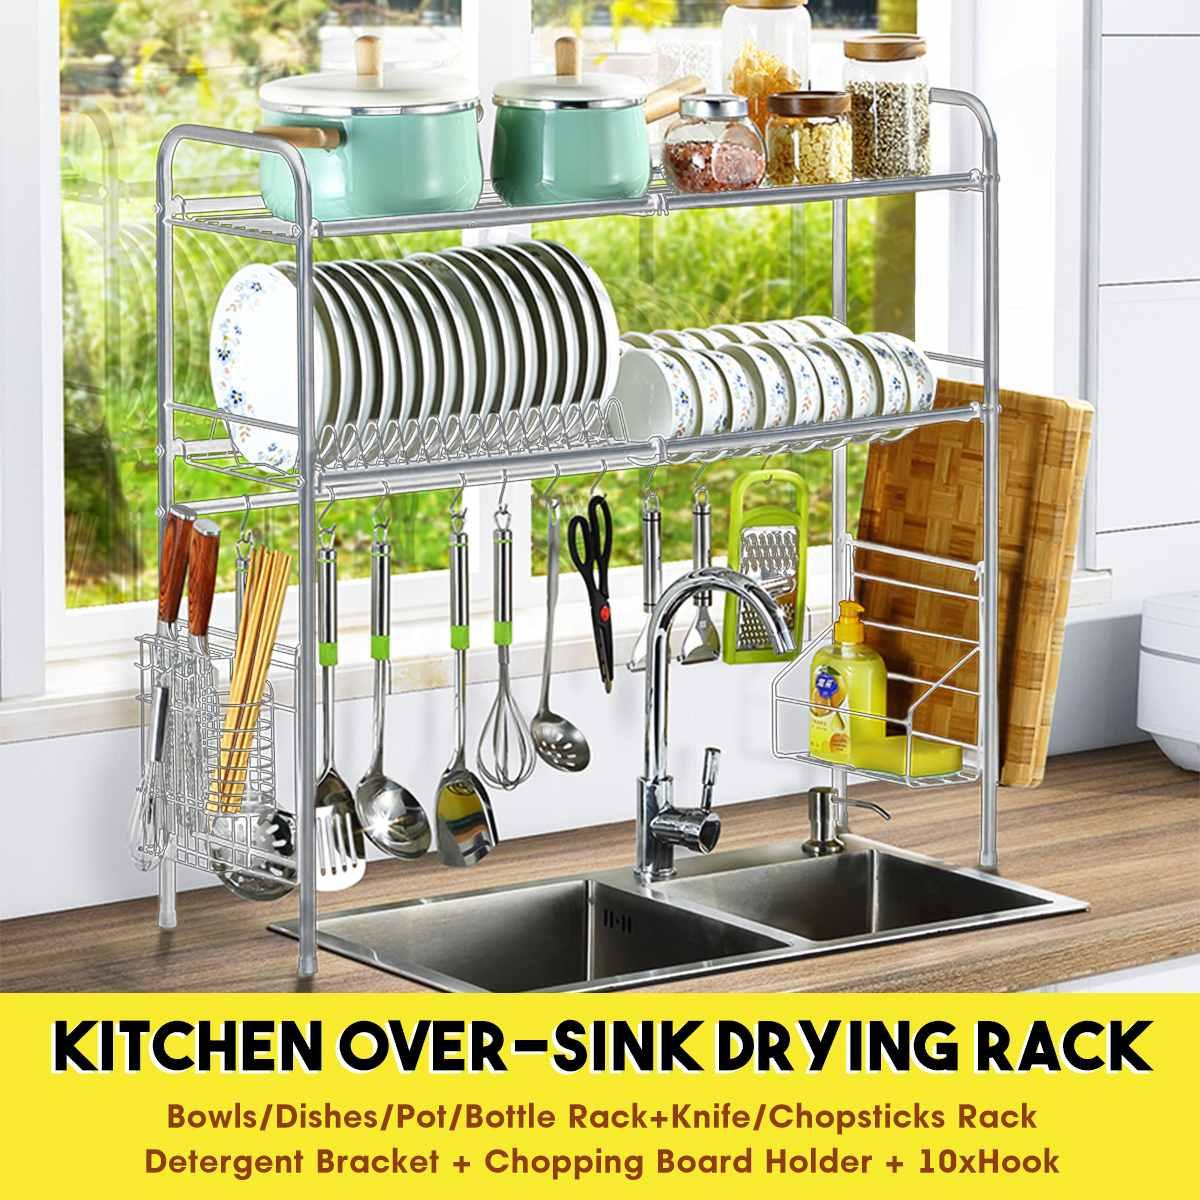 Single/Double Tier Over The Sink Dish Drying Rack Holder Shelf Drainer Storage Organizer Kitchen 65cm/85cm